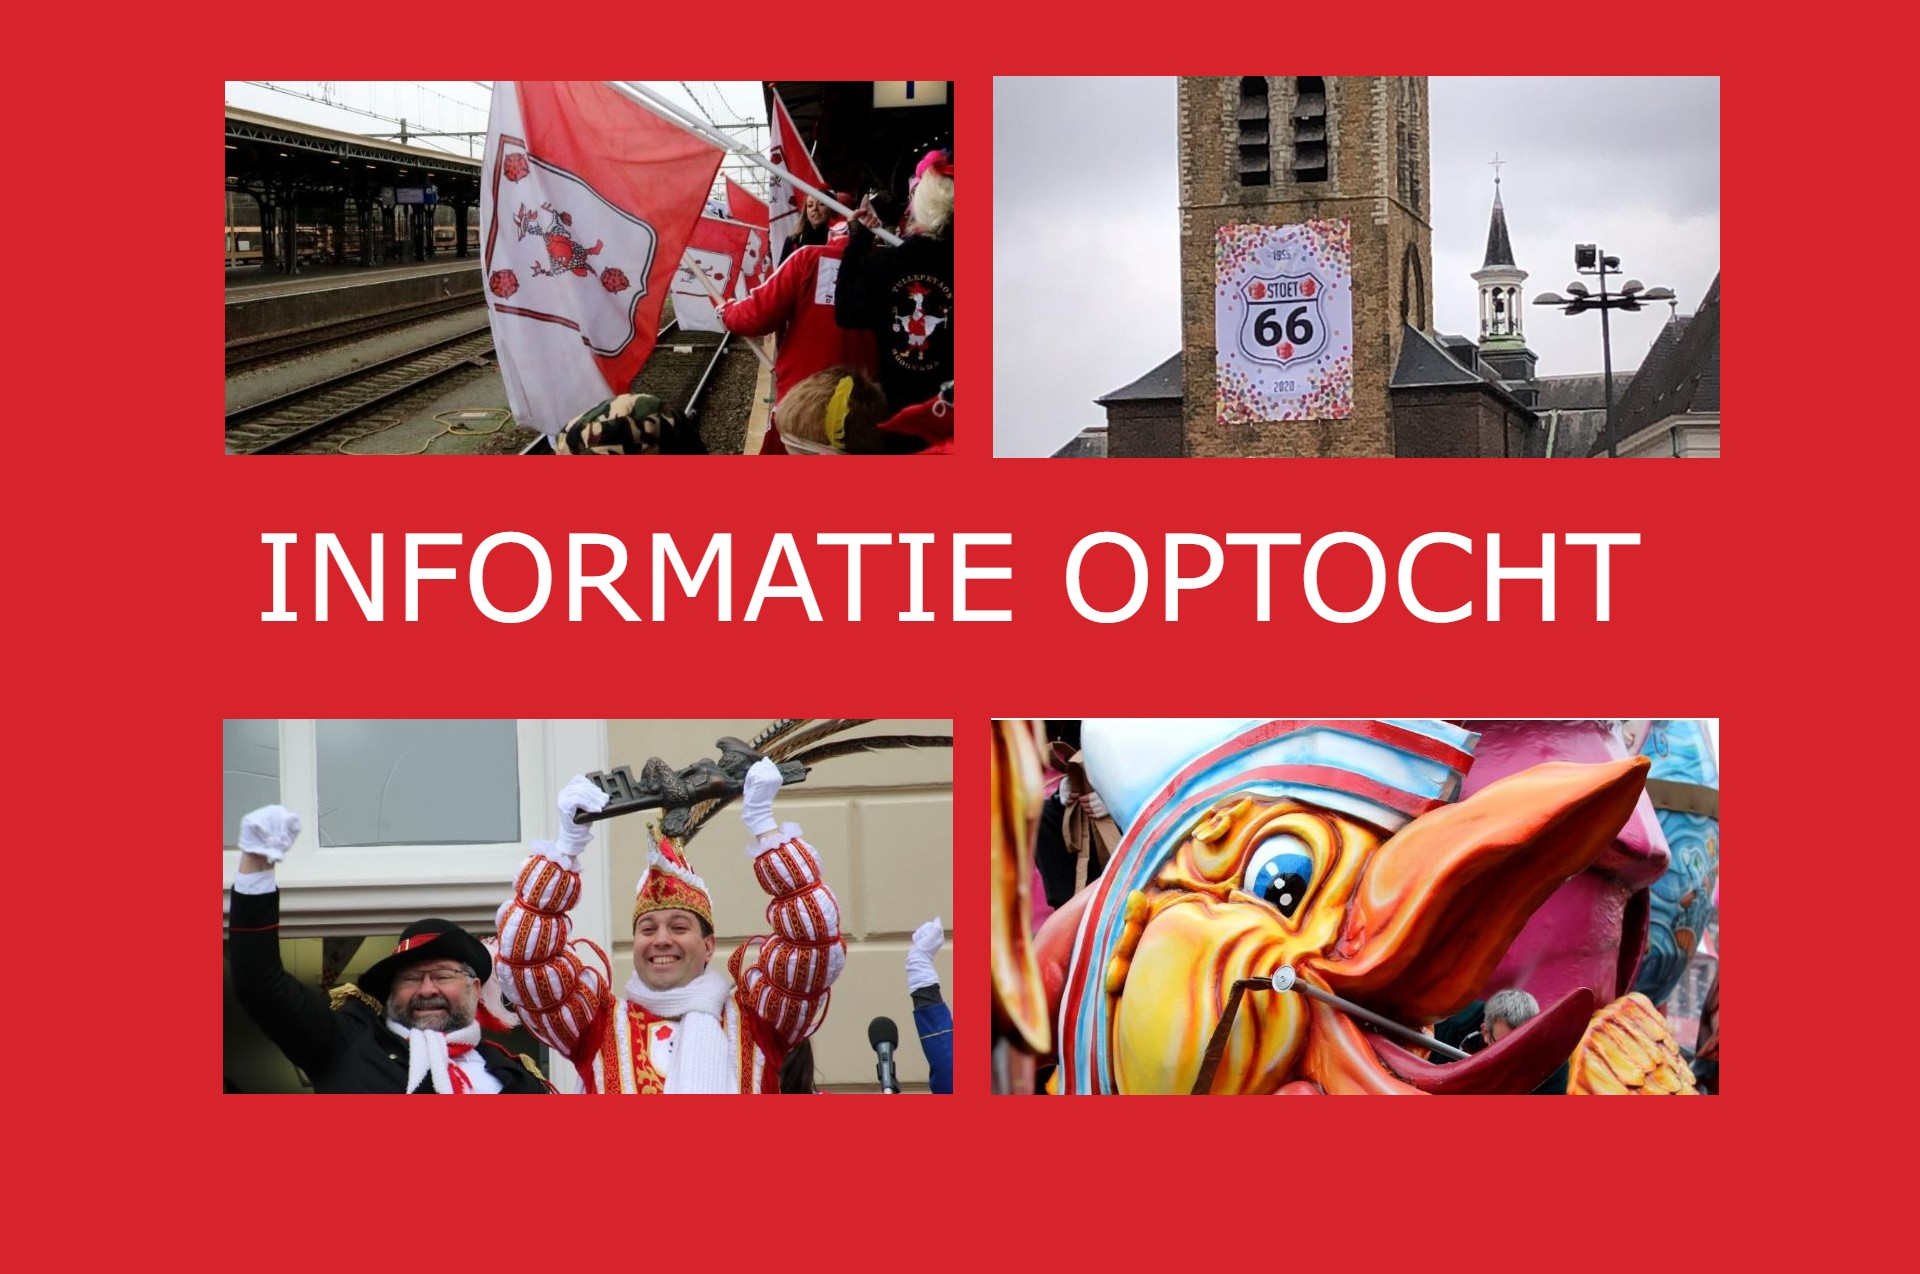 informatie optocht roosendaal stichting carnaval roosendaal